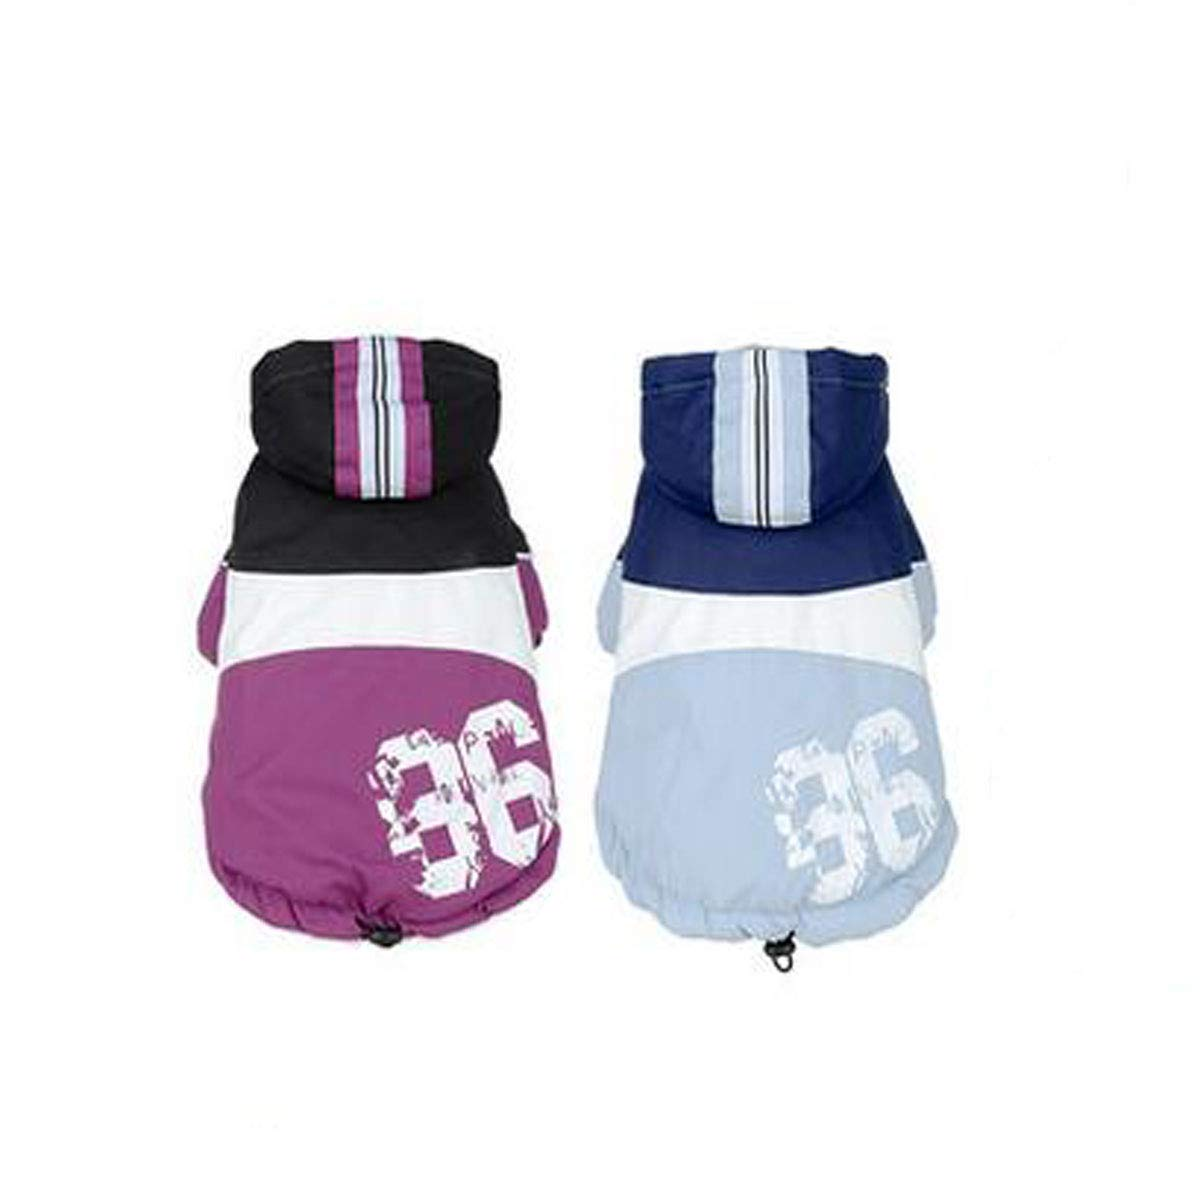 Purple 3XL Purple 3XL Pet Autumn and Winter Clothes, Suitable for Shepherd Dogs, golden Retrievers, Large and Medium Dog Clothing (color   Purple, Size   3XL)